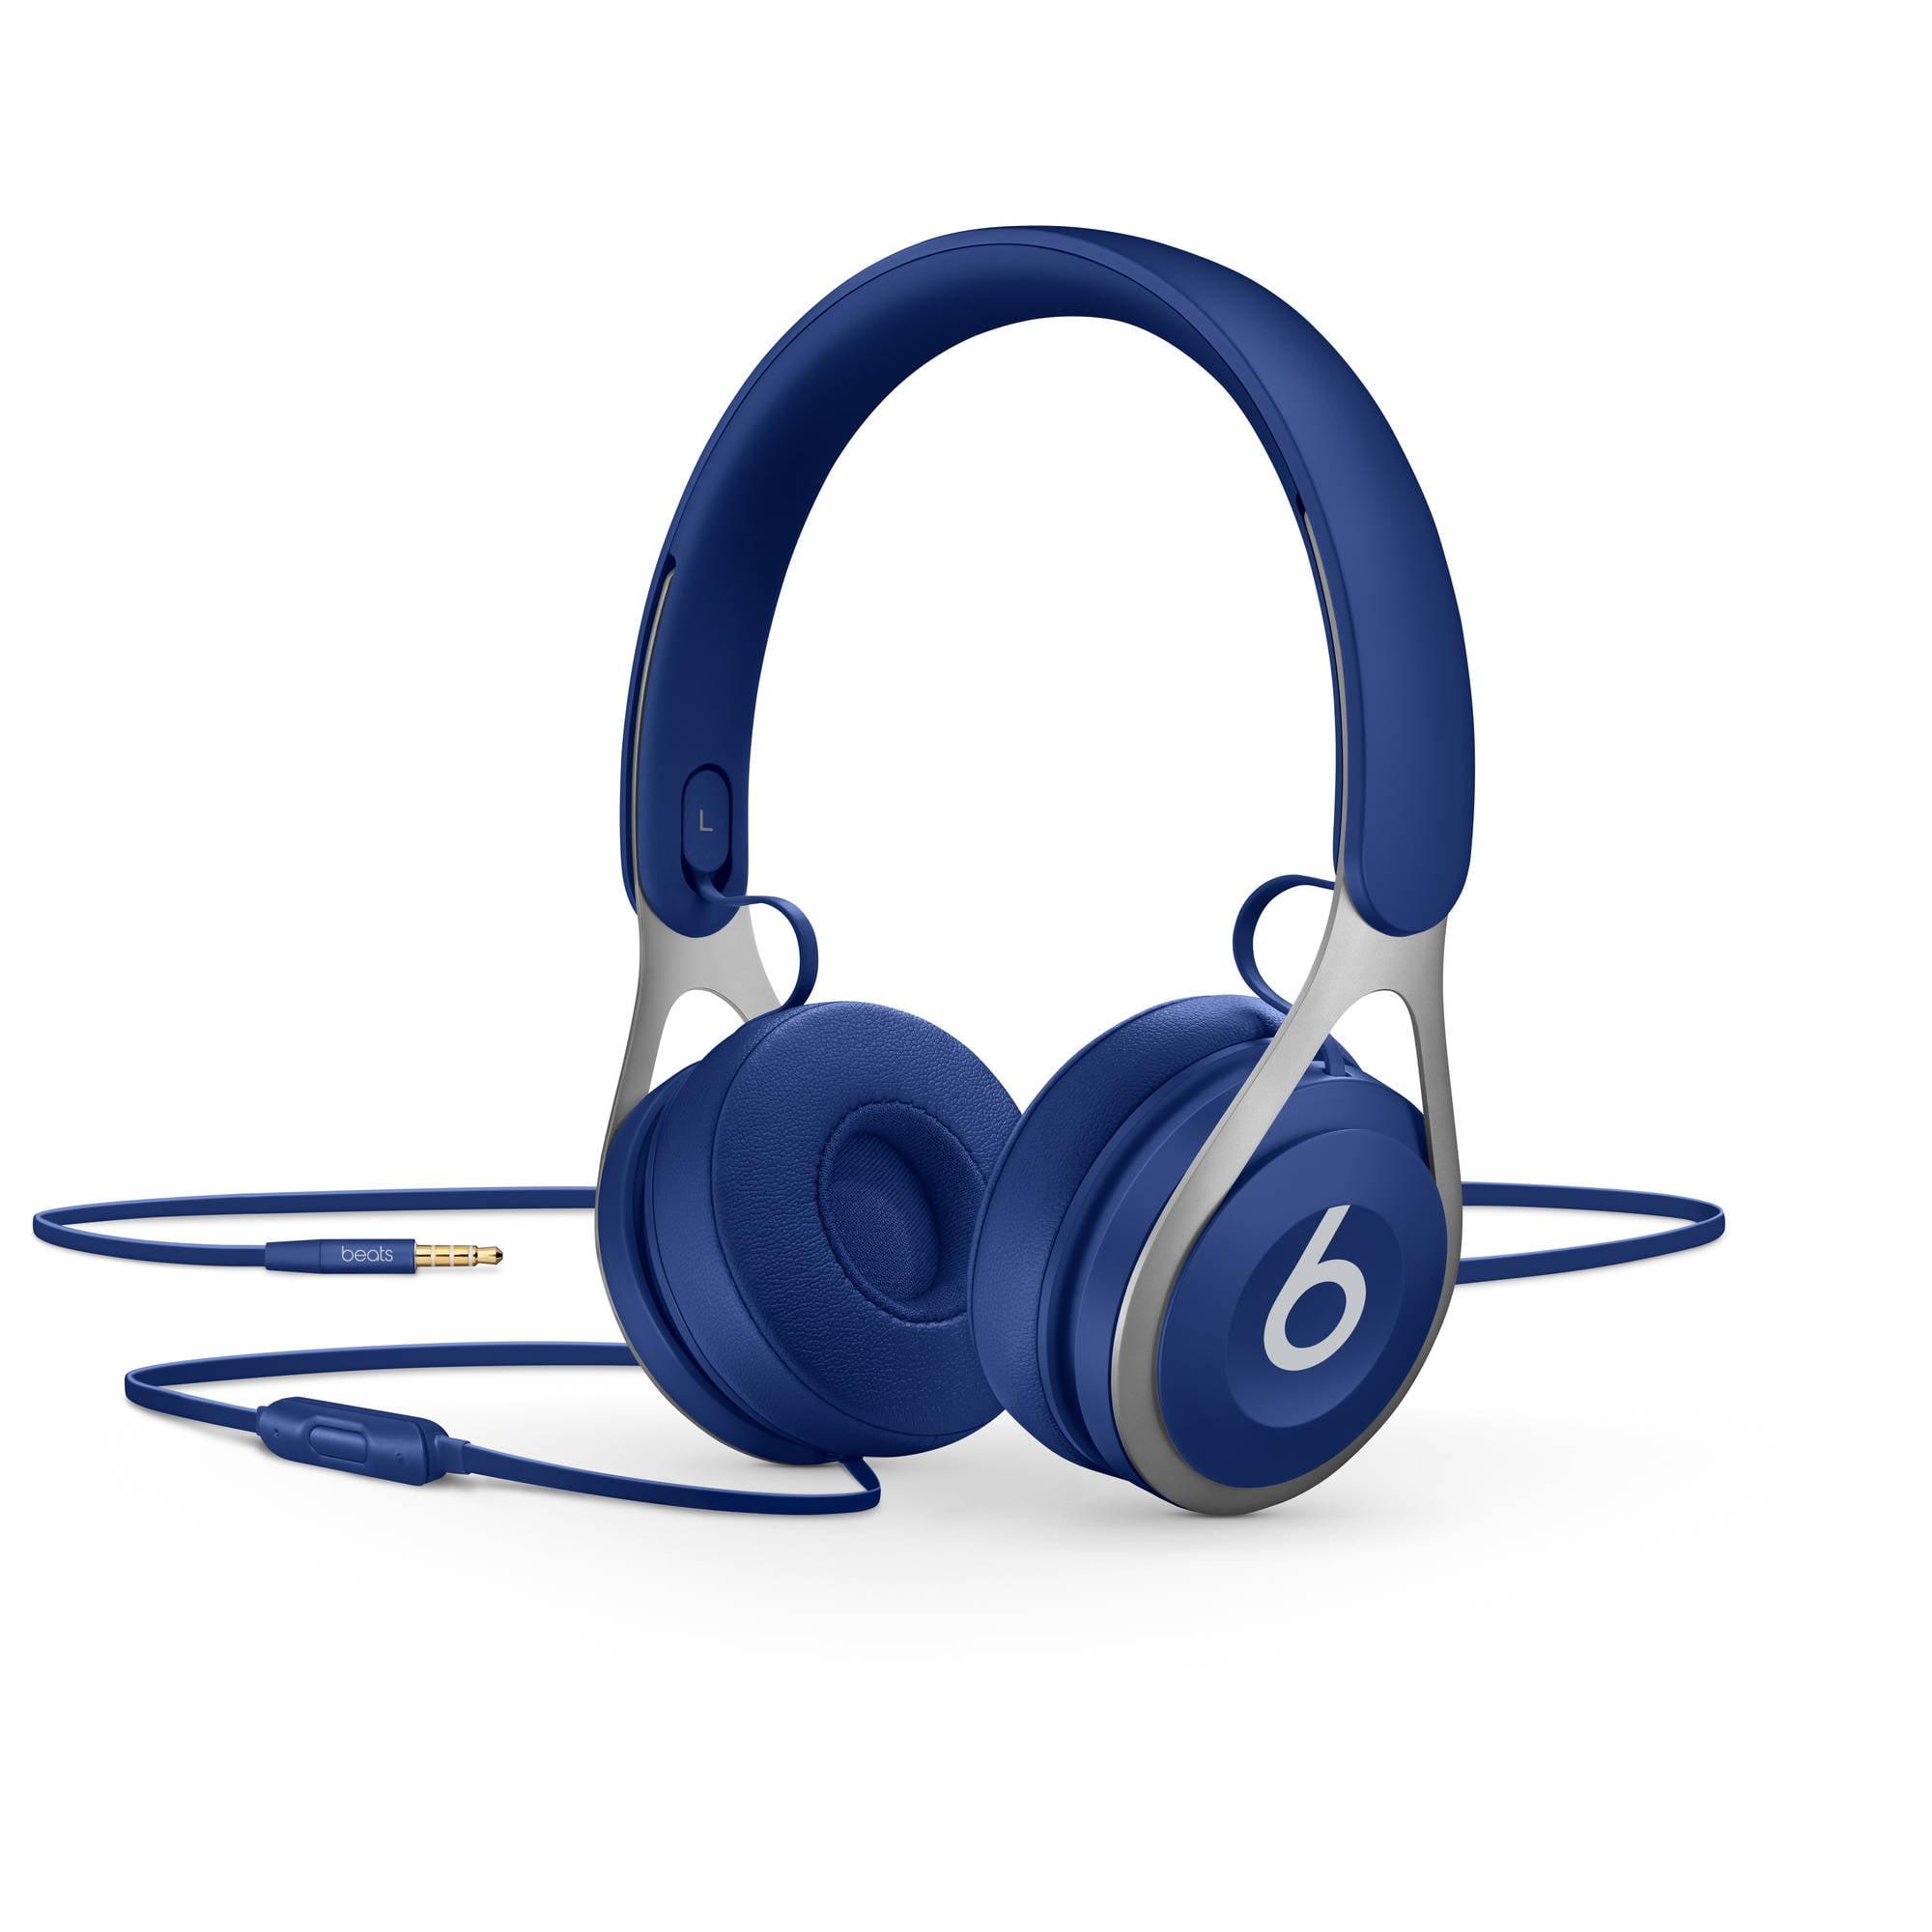 Tremendous Beats By Dre Headphone Wiring Diagram Schematic Diagram Download Wiring 101 Orsalhahutechinfo